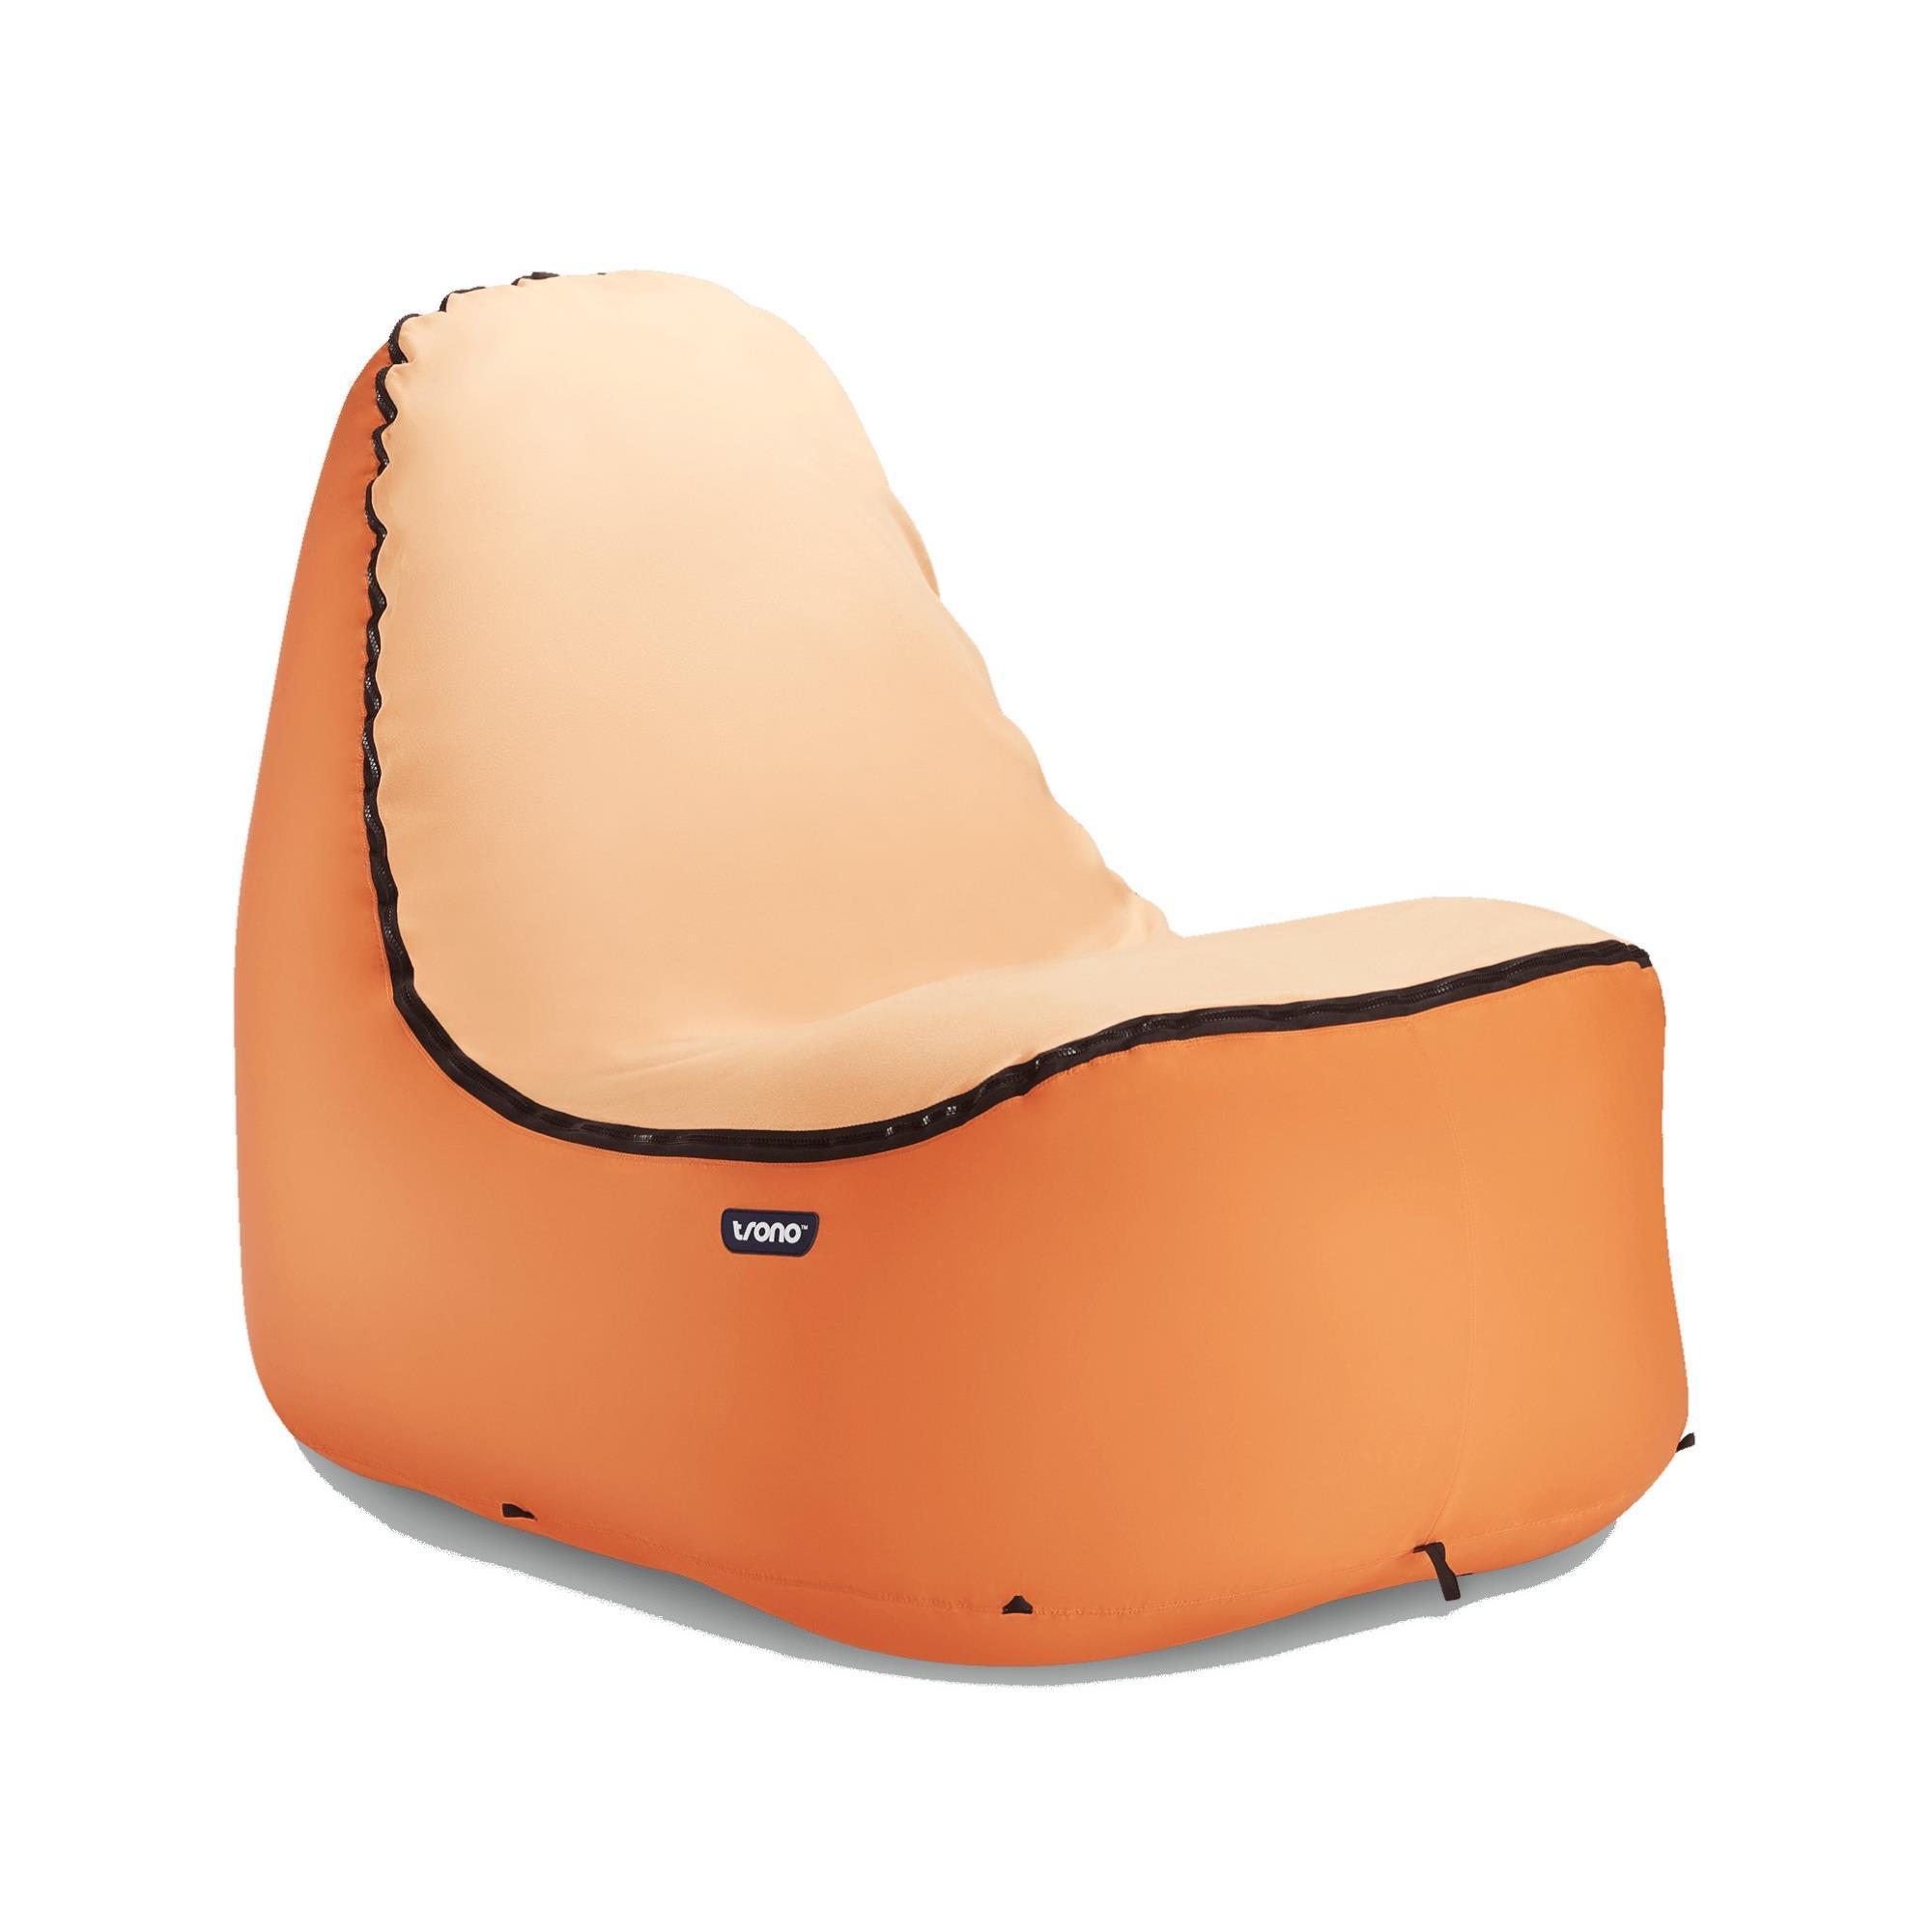 trono TRONO Chair aufblasbarer Campingsessel orange